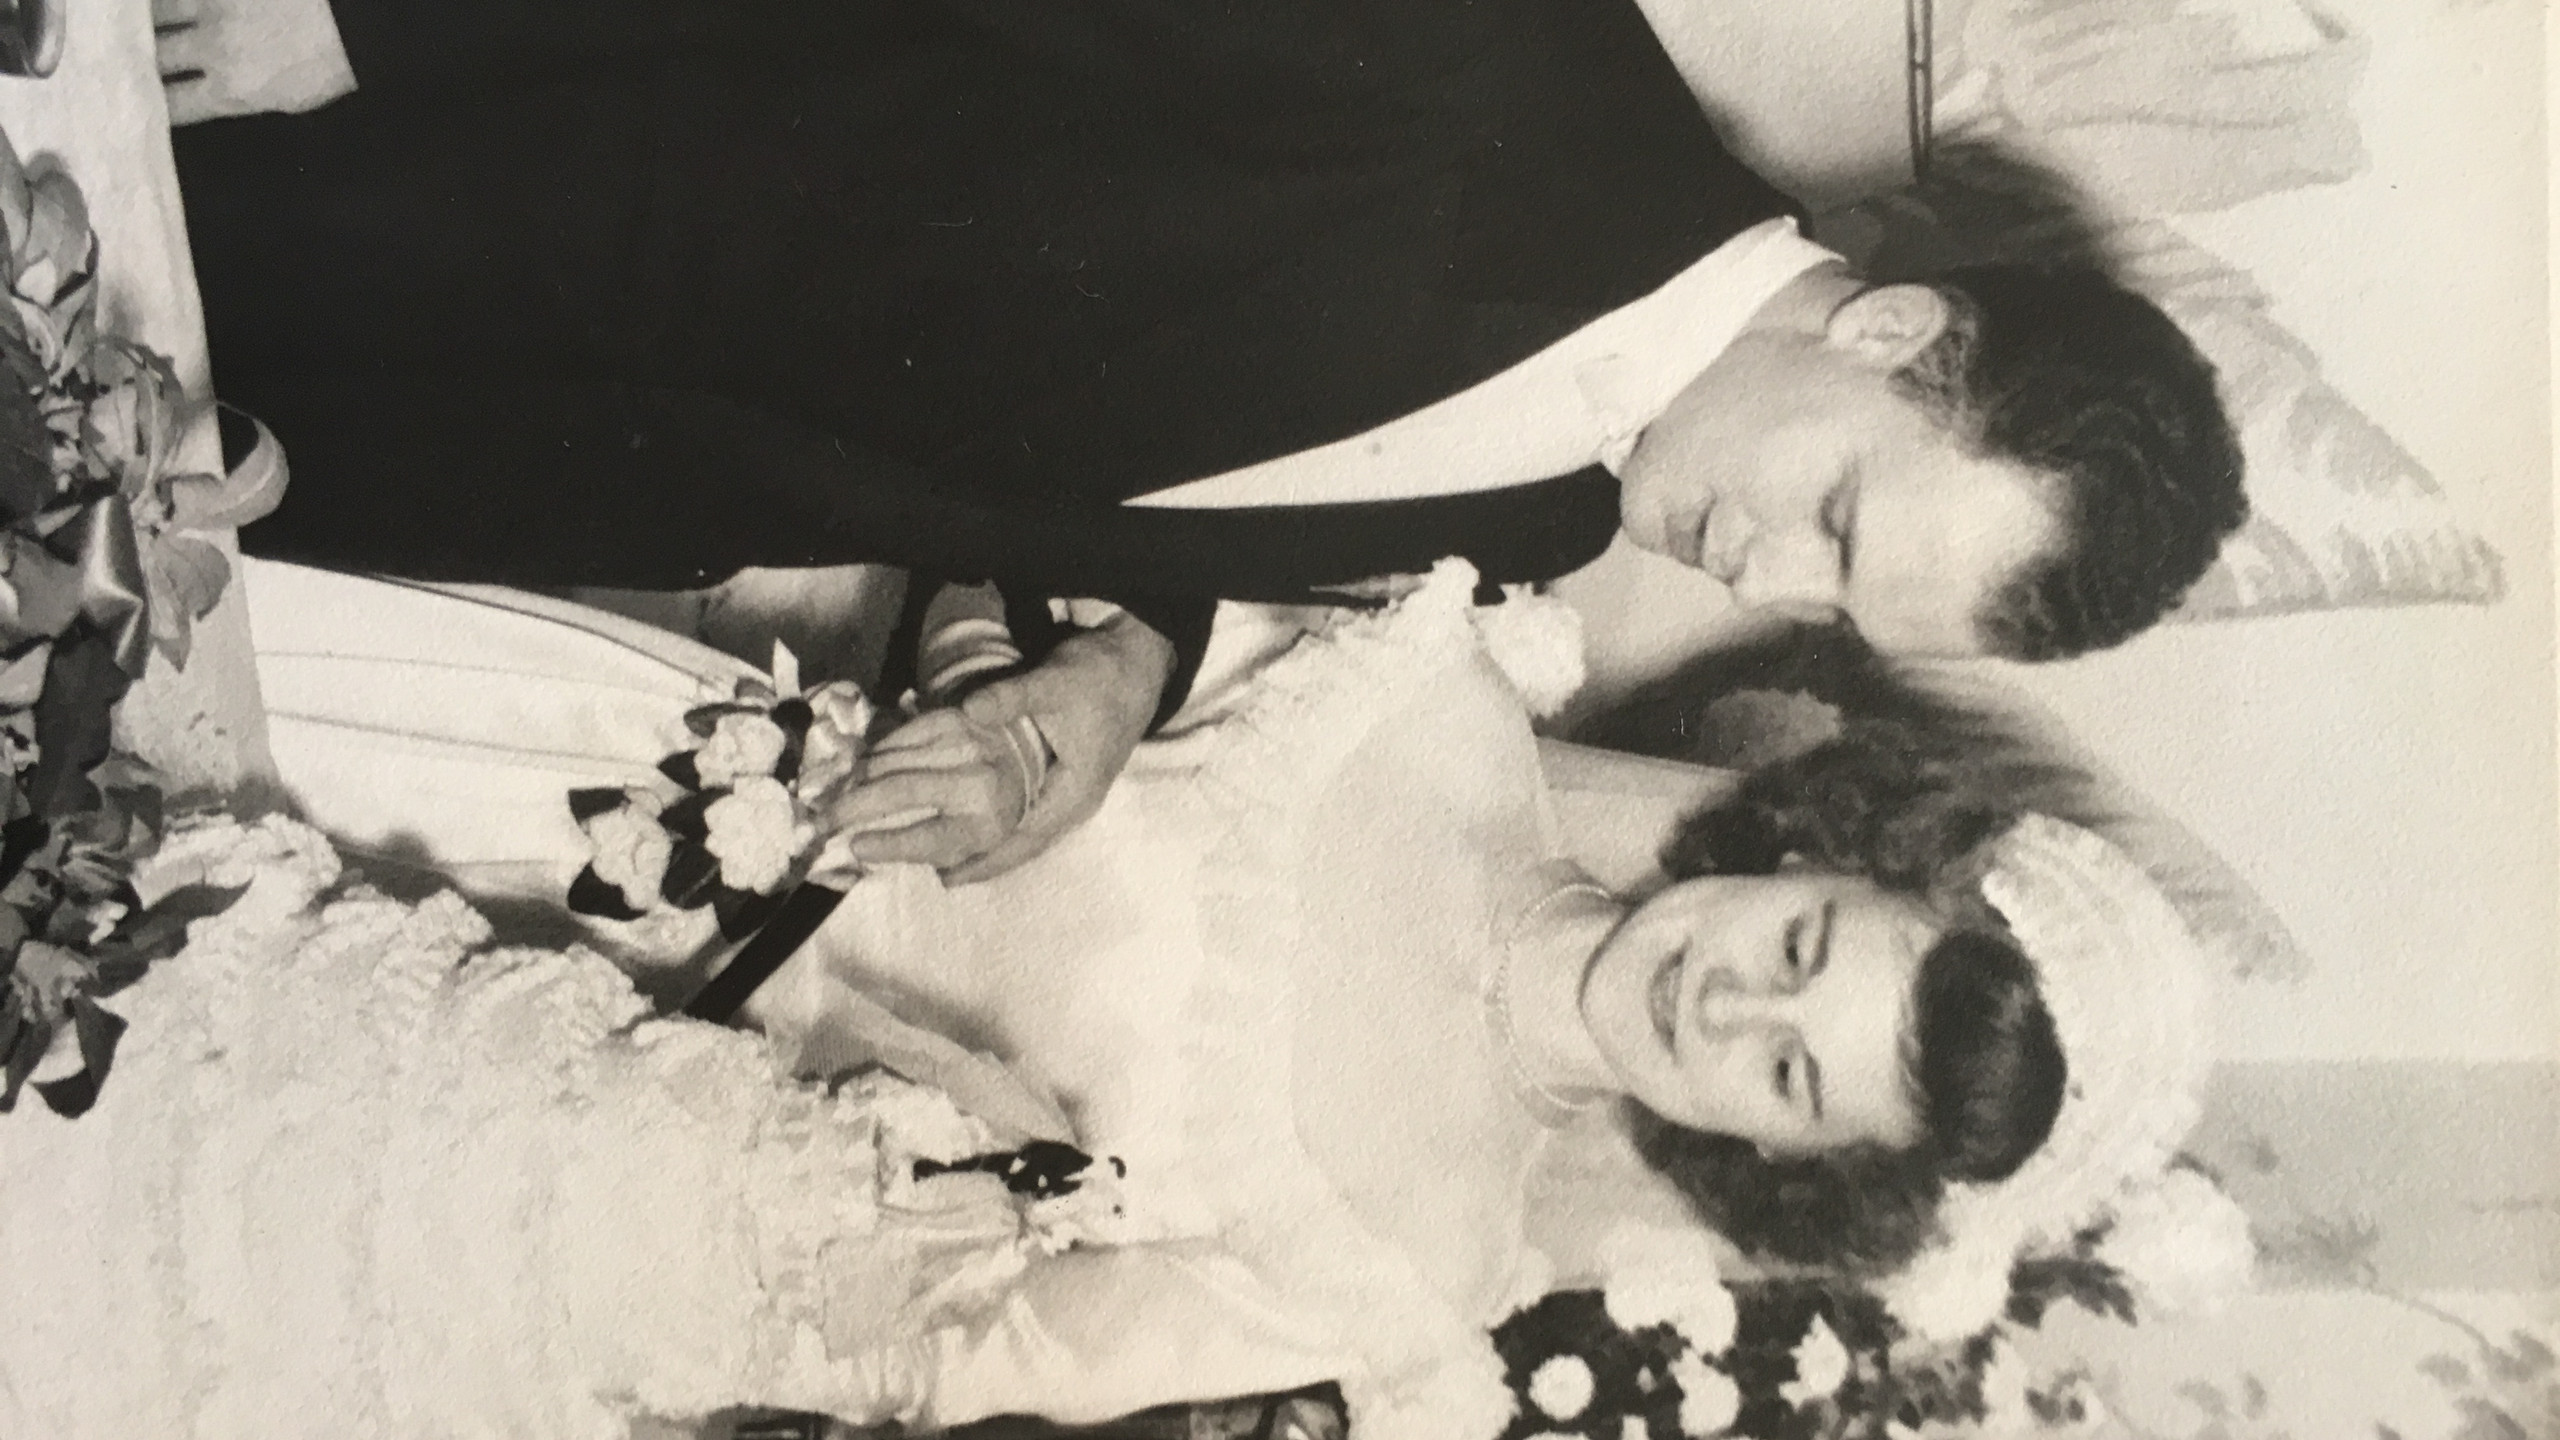 John and Bernice Stiner cutting wedding